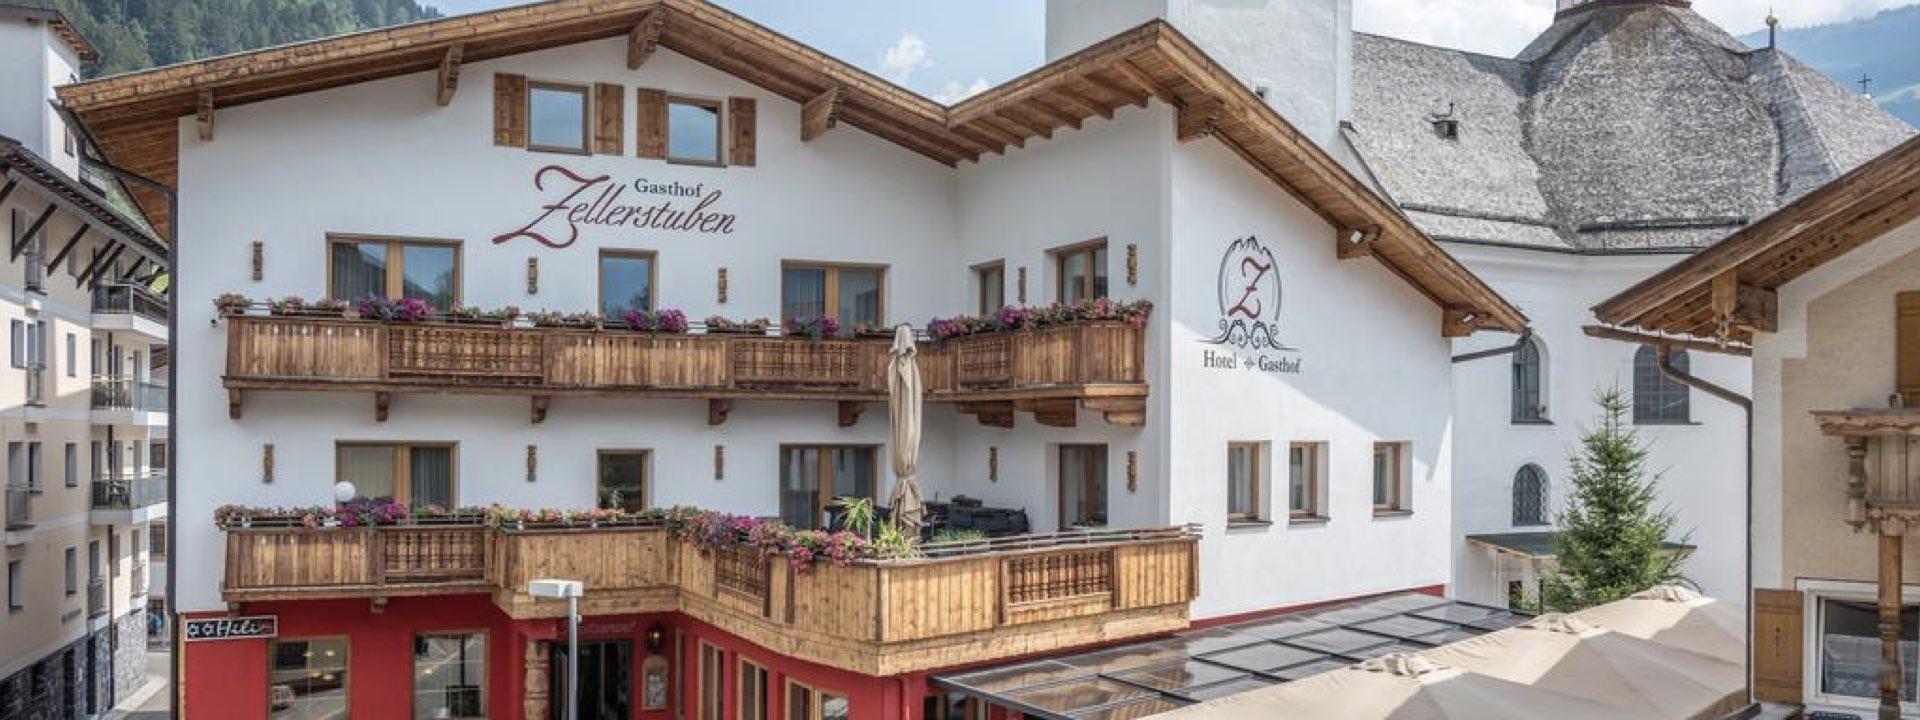 Zillertal: Gasthof (HOTELBUS/KABINEBUS) – halvpension